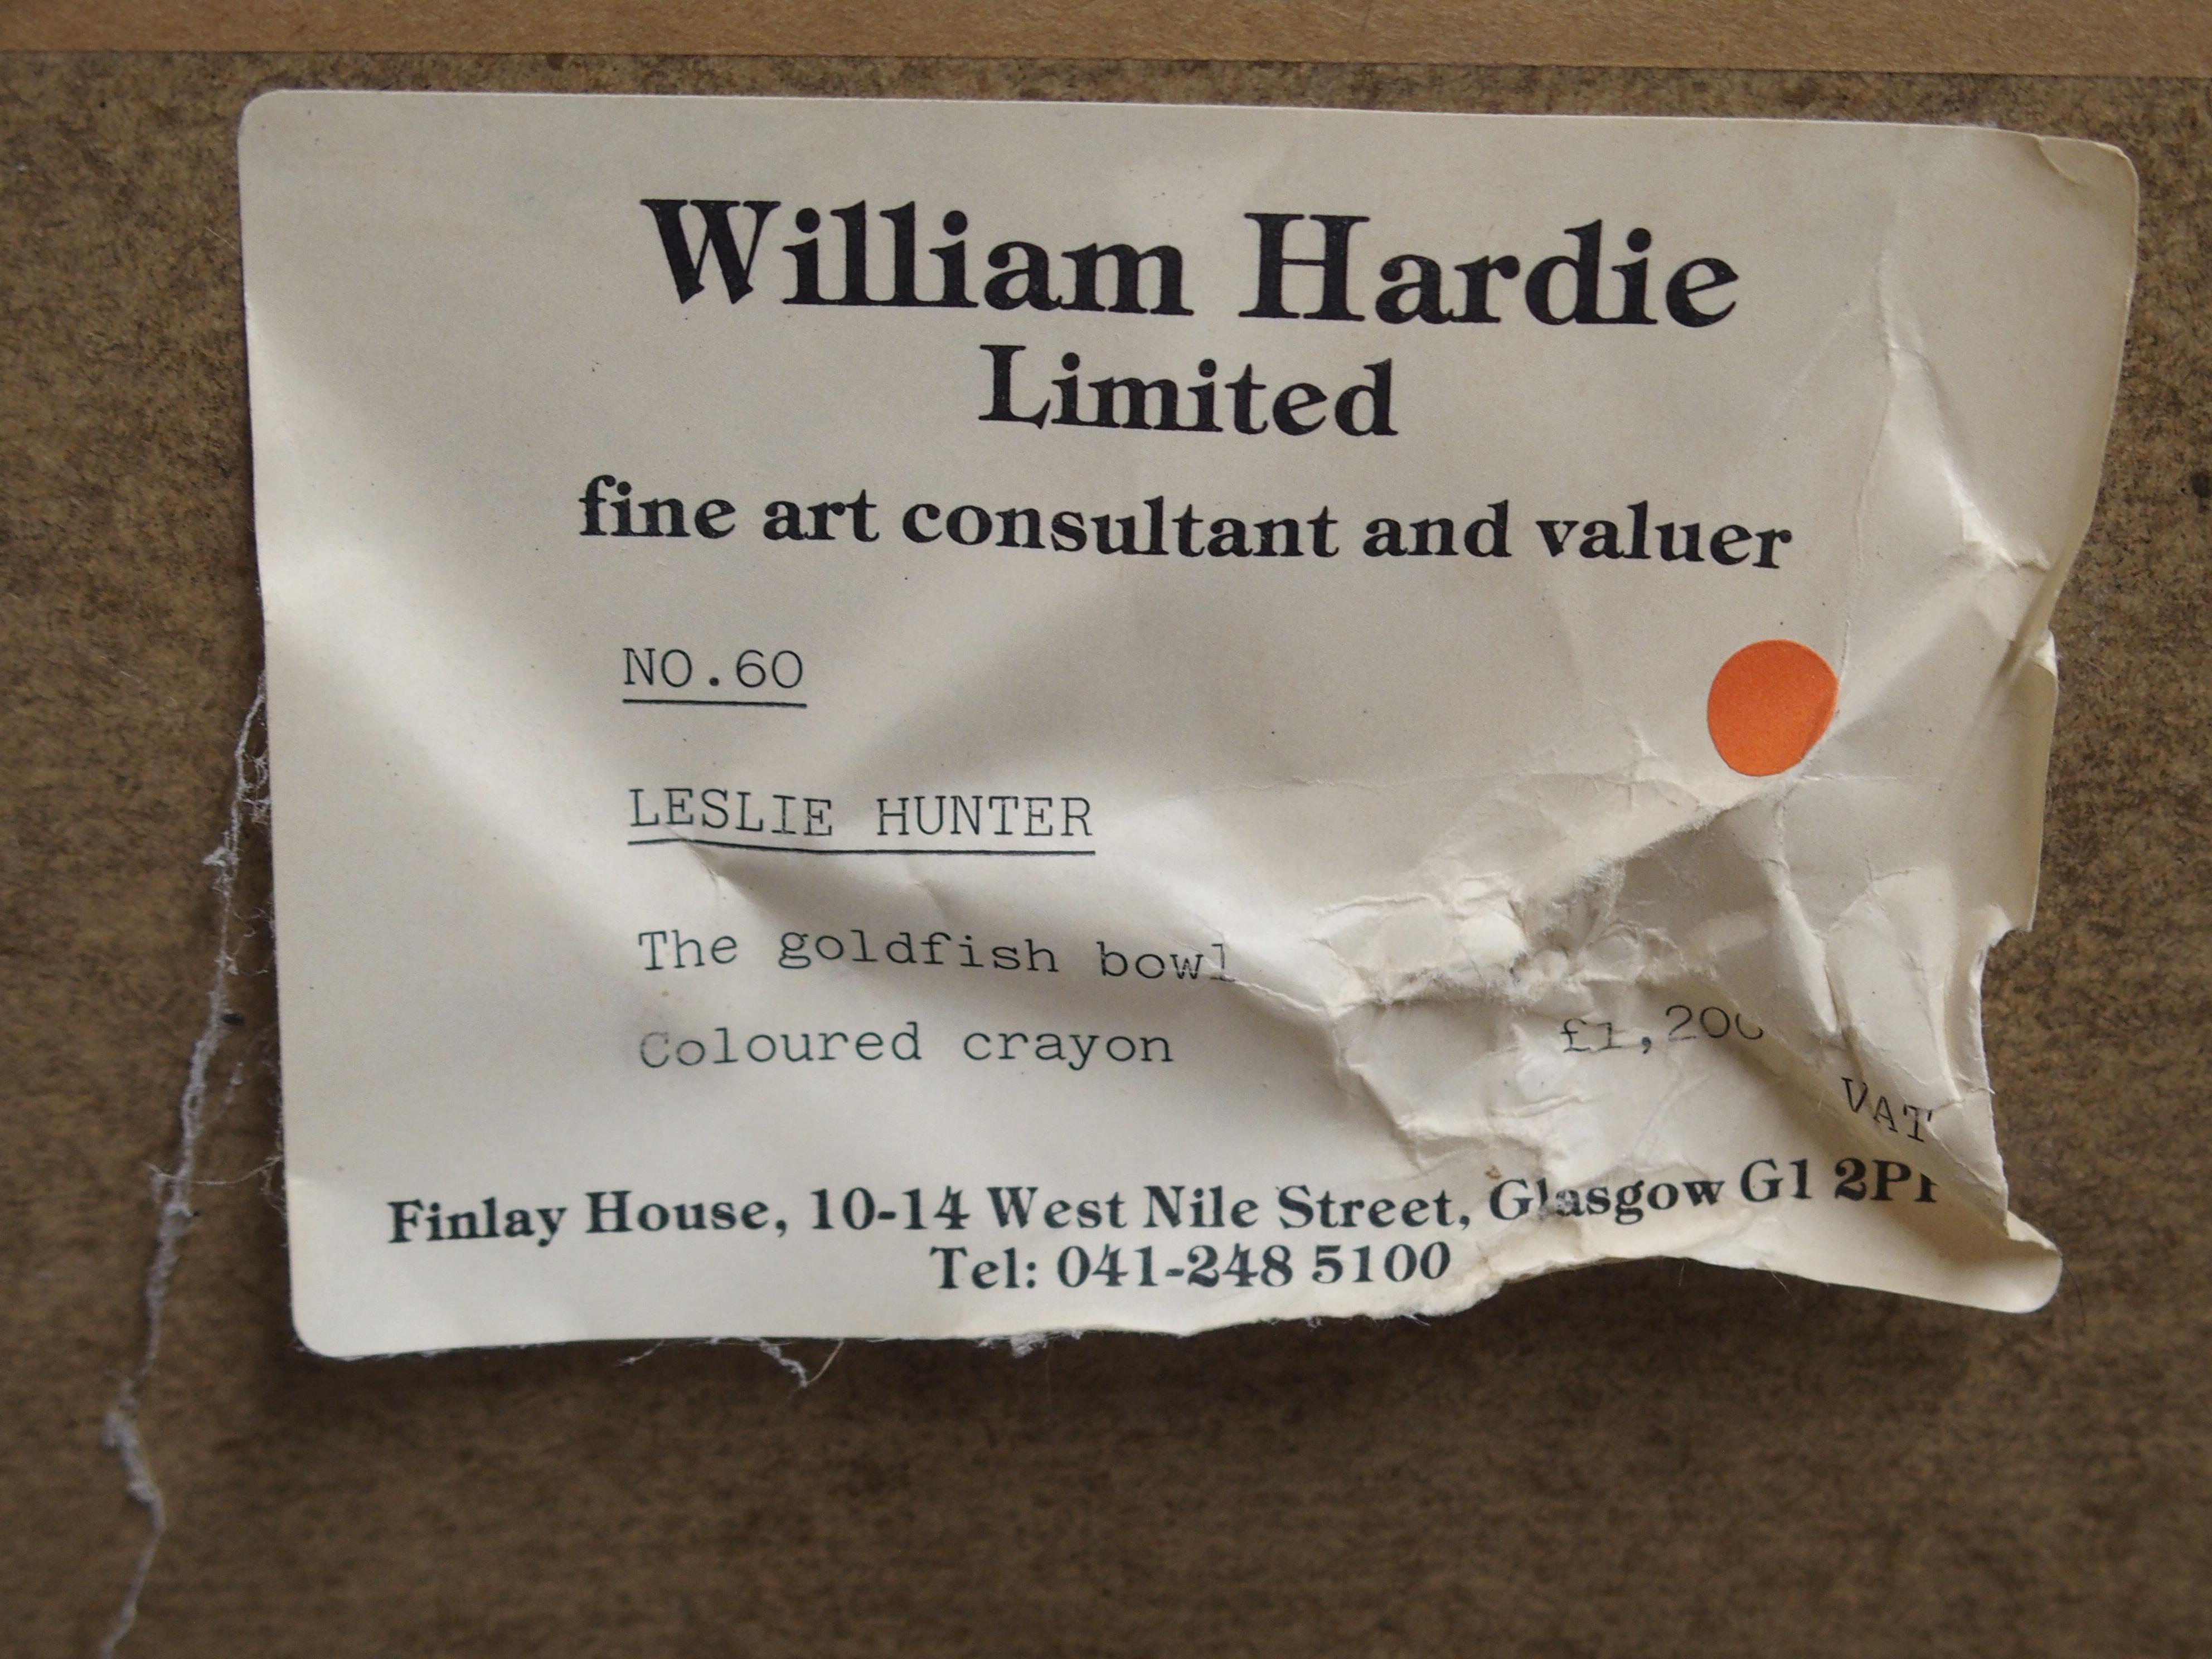 GEORGE LESLIE HUNTER (SCOTTISH 1877-1931) THE GOLDFISH BOWL colour crayon, 58 x 43cm William - Image 3 of 3